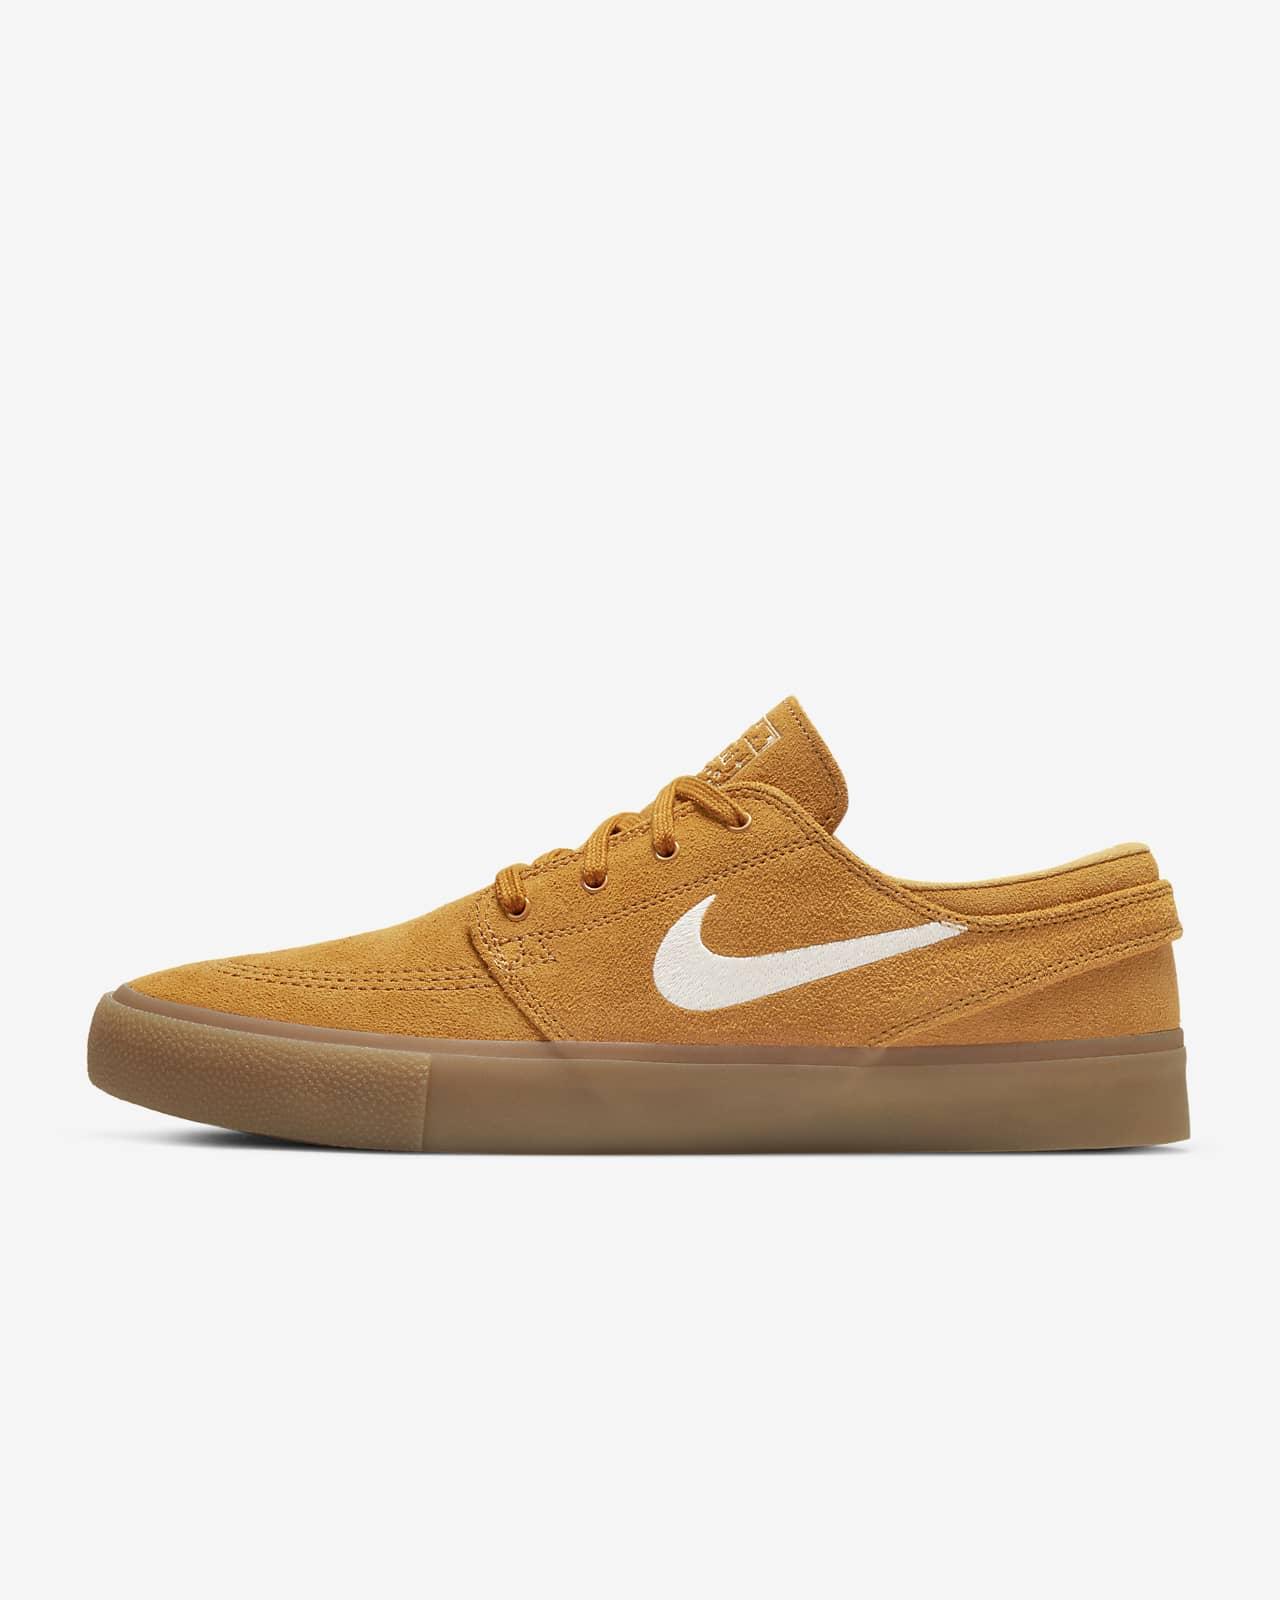 Nike SB Zoom Stefan Janoski RM 滑板鞋